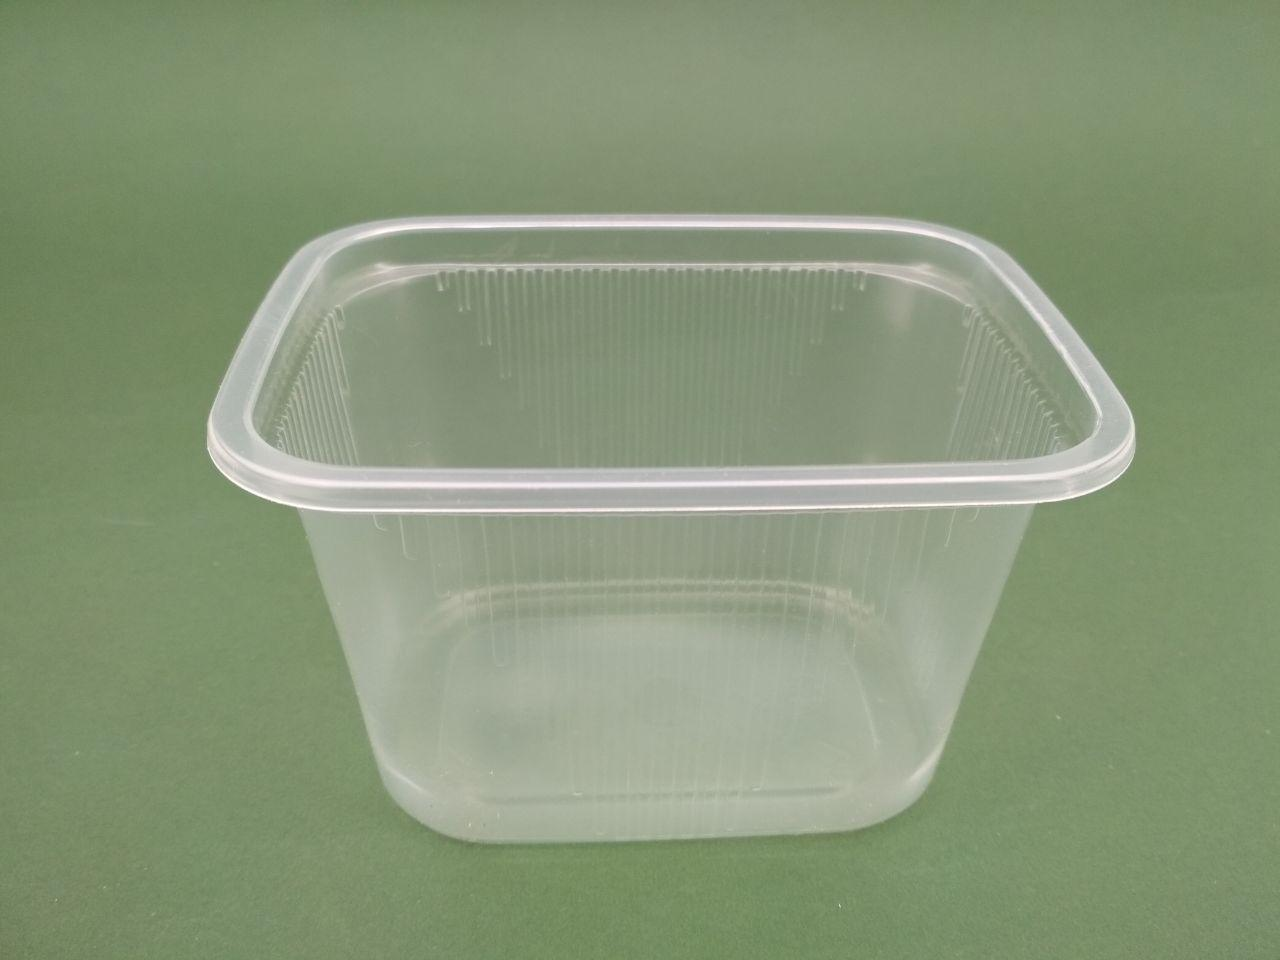 Одноразовый контейнер для супа, сметаны, меда, салатов SL5883, (V=350мл), 50 шт/пач